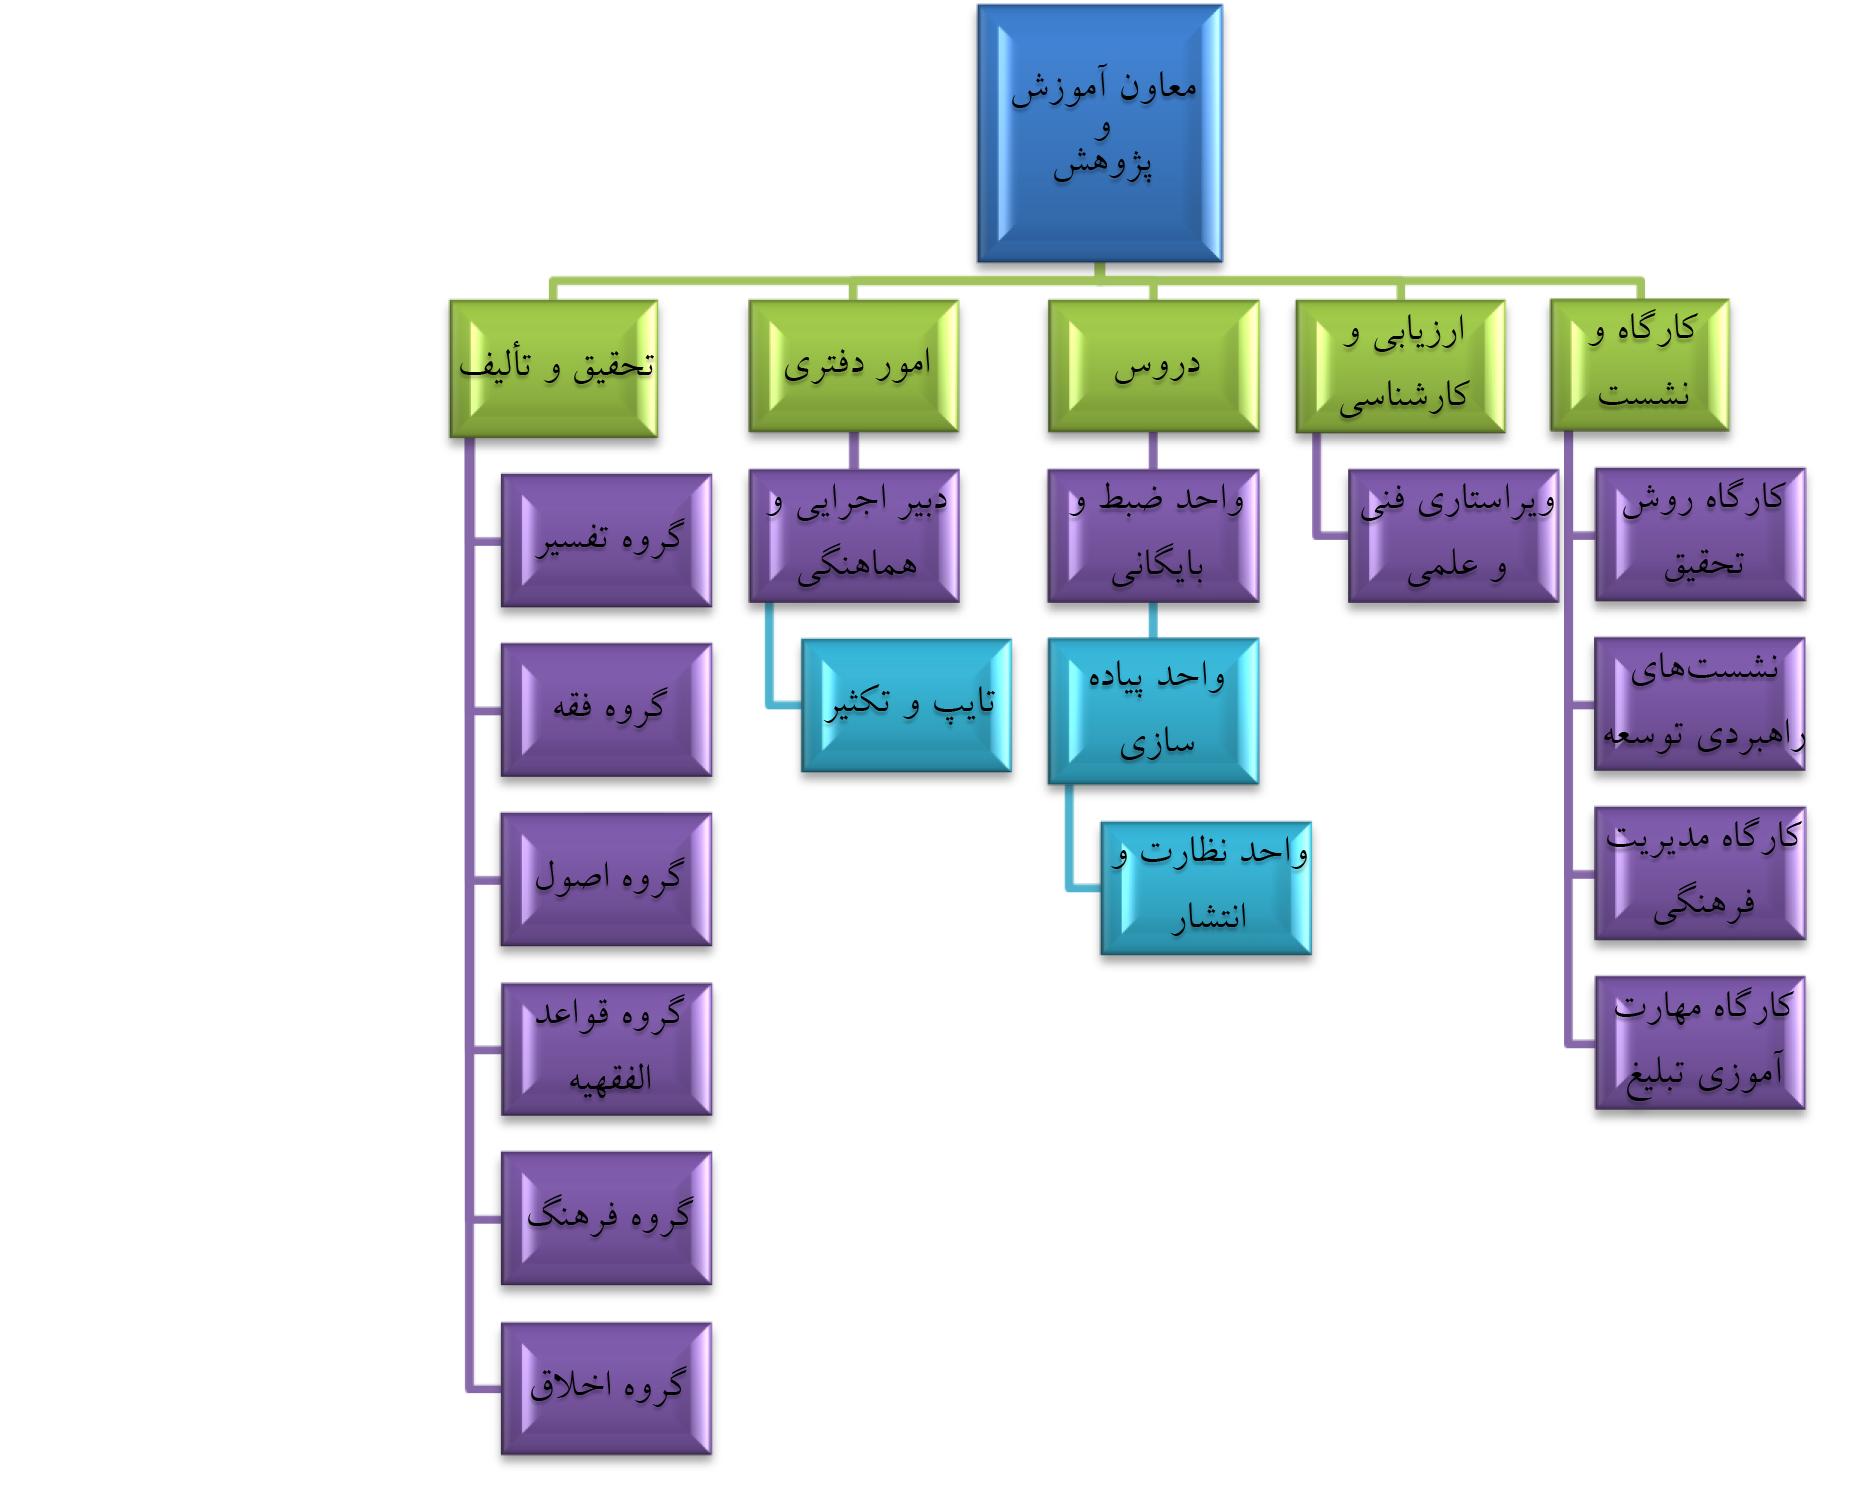 http://www.bushehri.net/images/menu-moassese/180%202.jpg